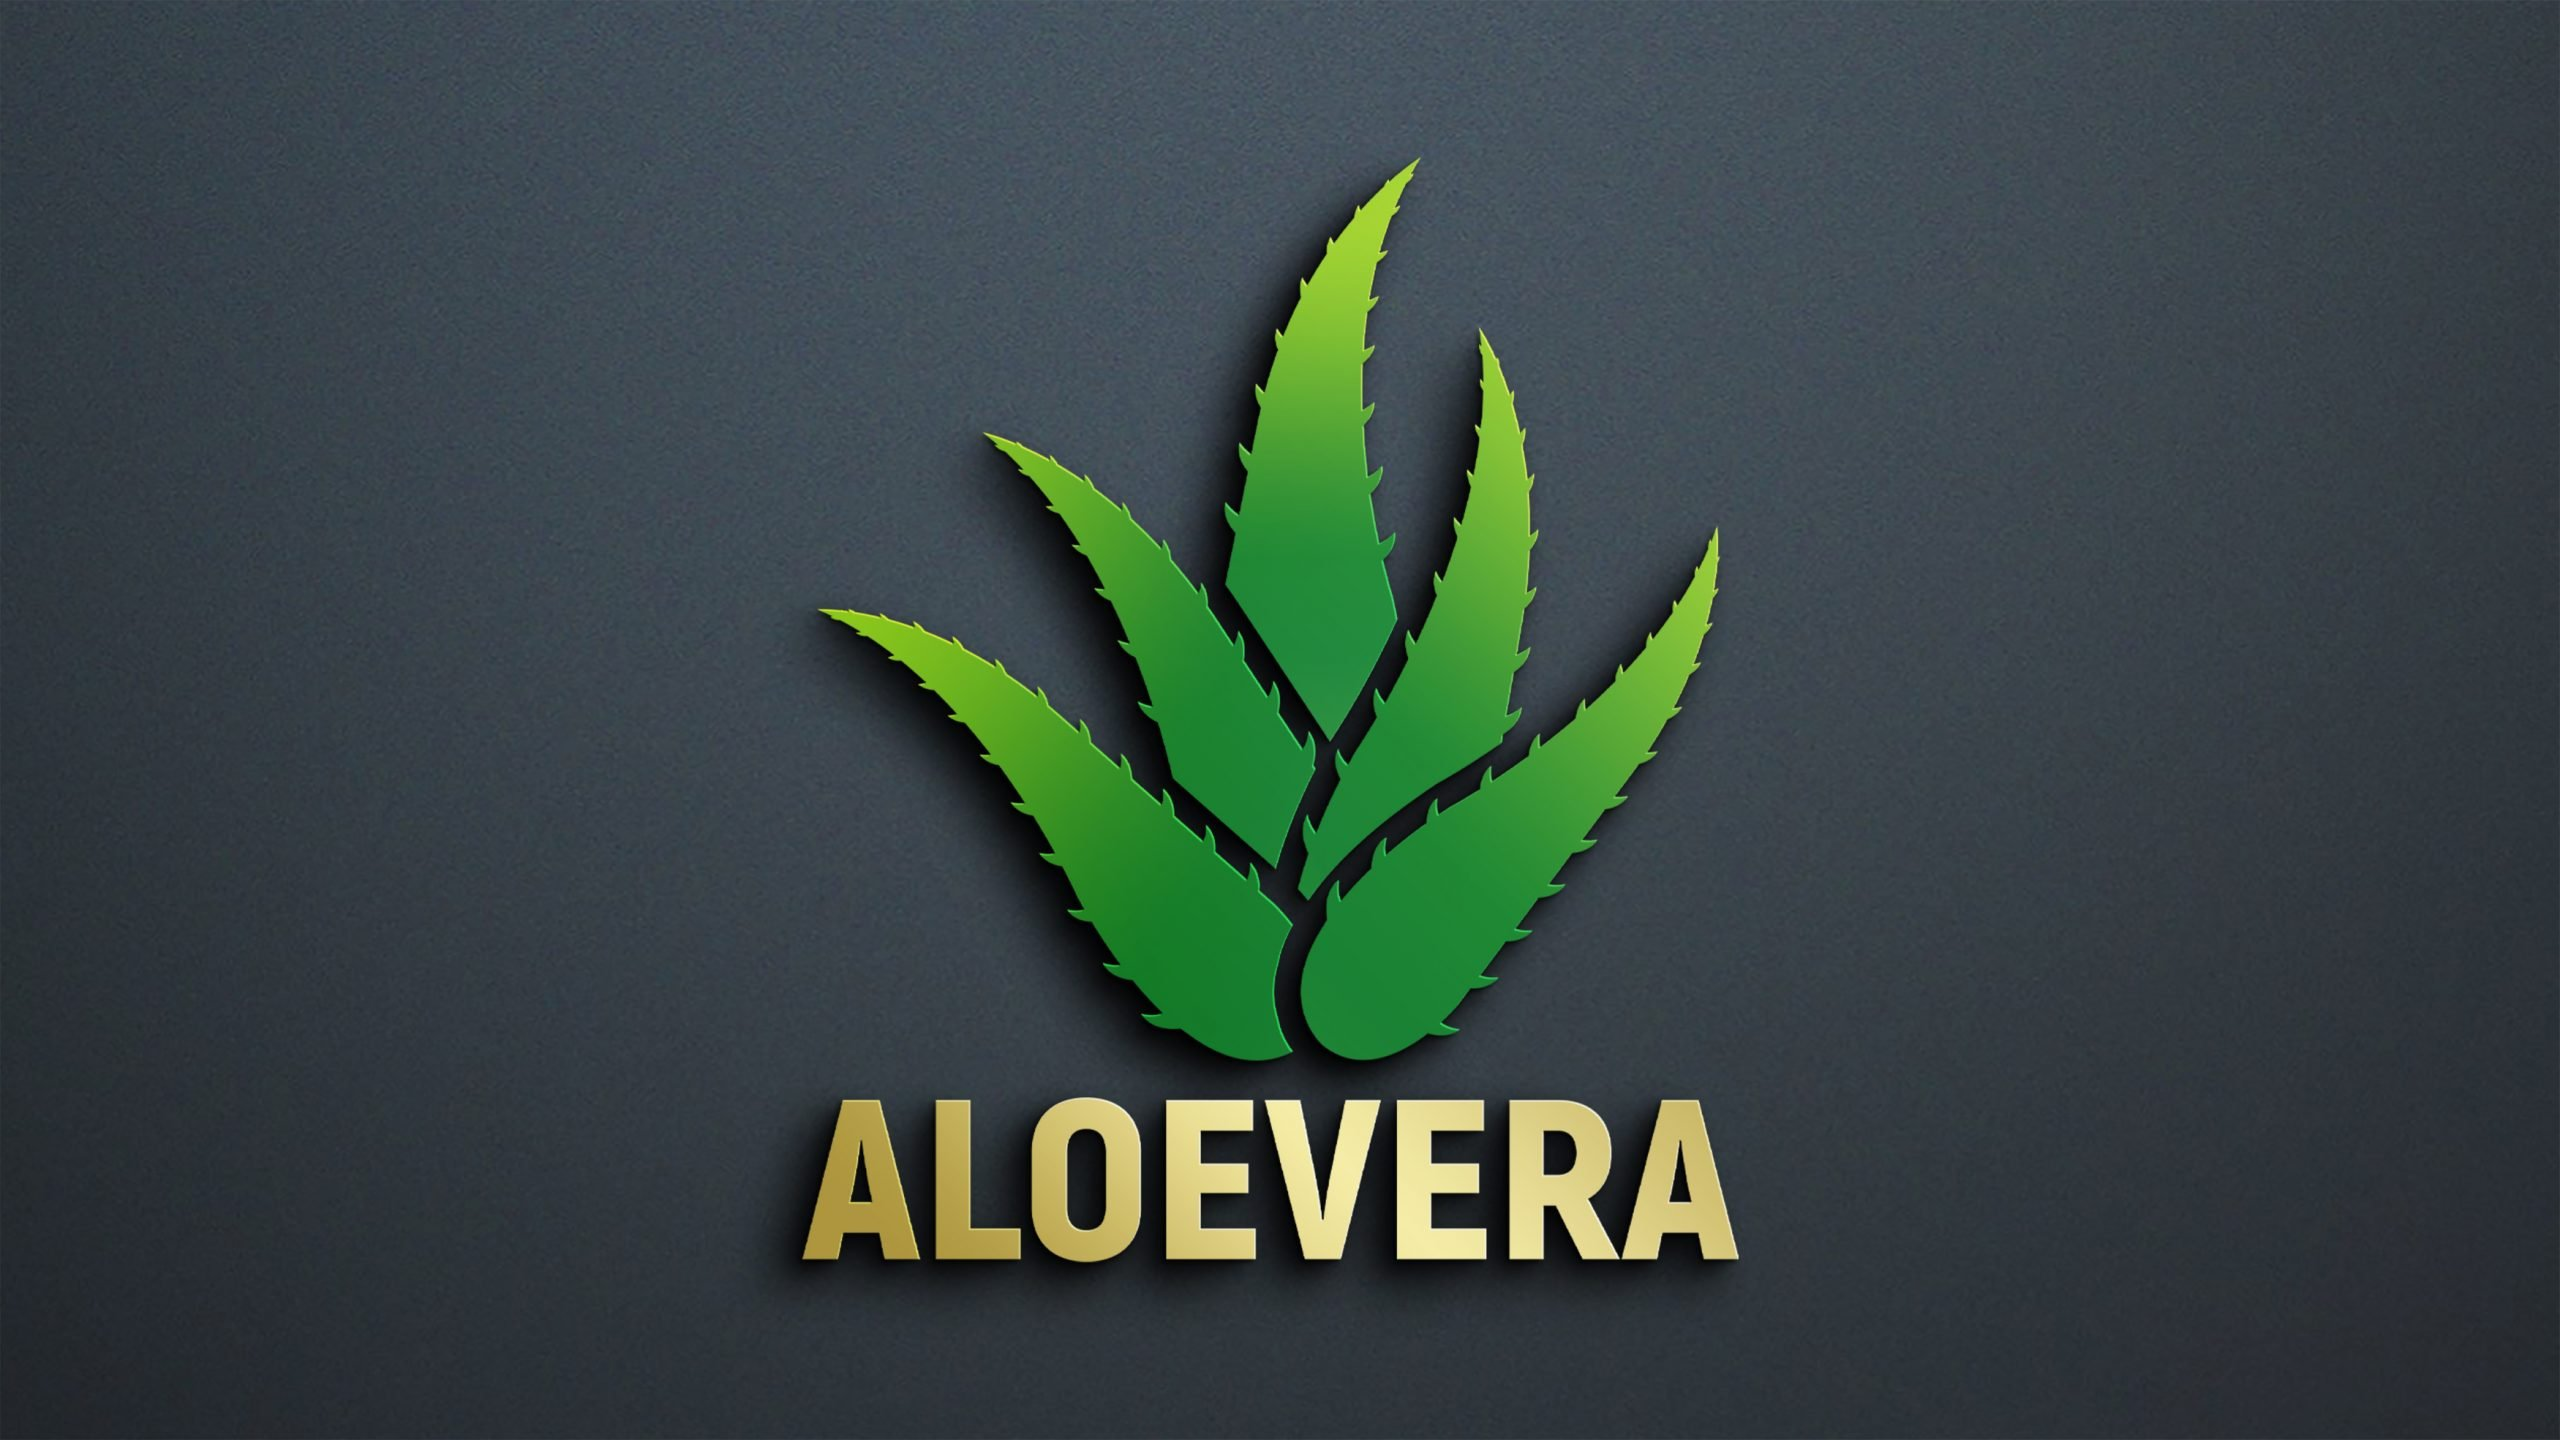 Download-Aloevera-Logo-Design-Free-PSD